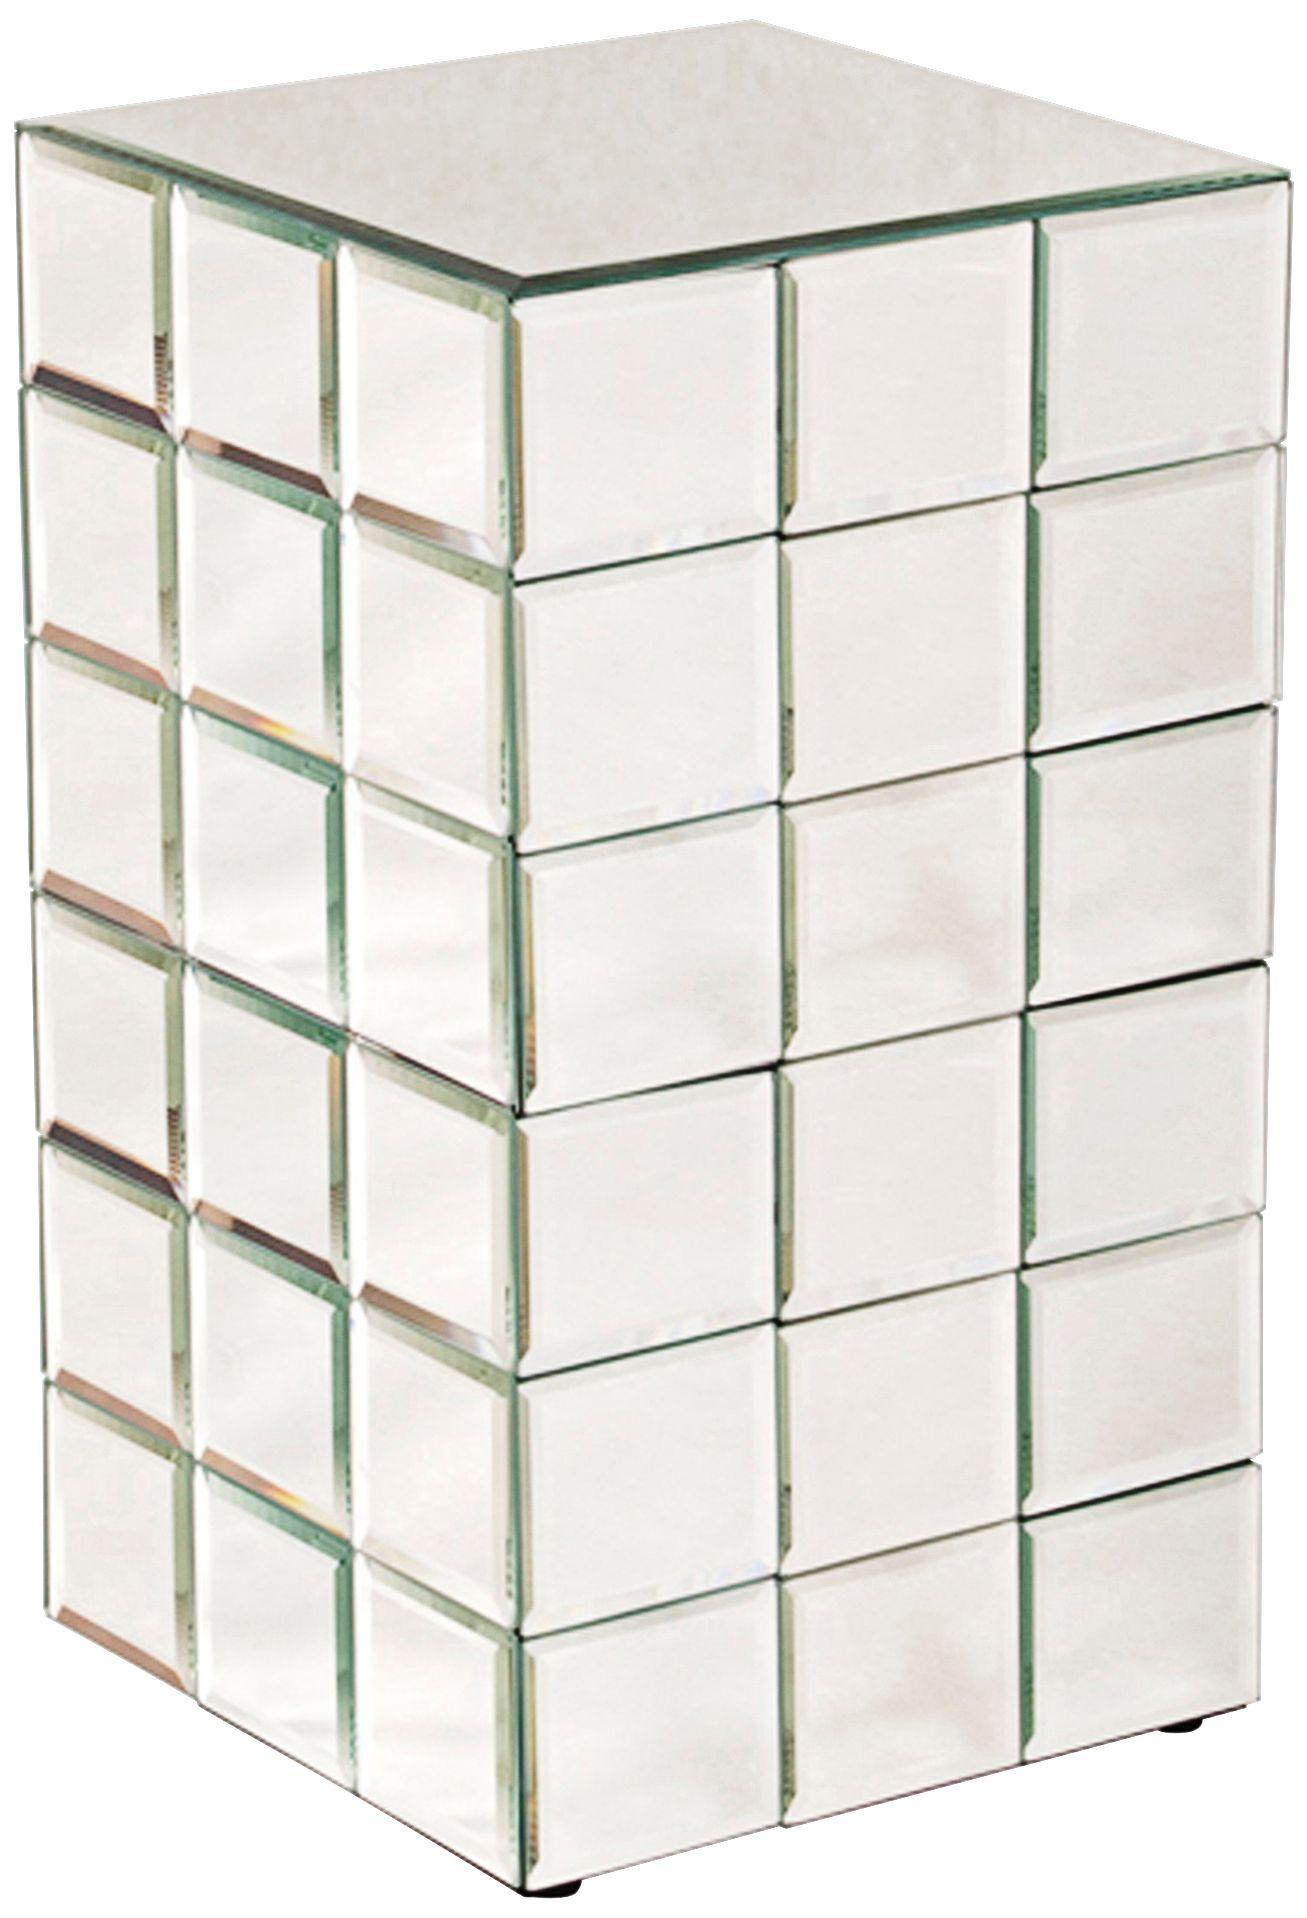 Howard Elliott Antares Mirror Puzzle Cube Pedestal